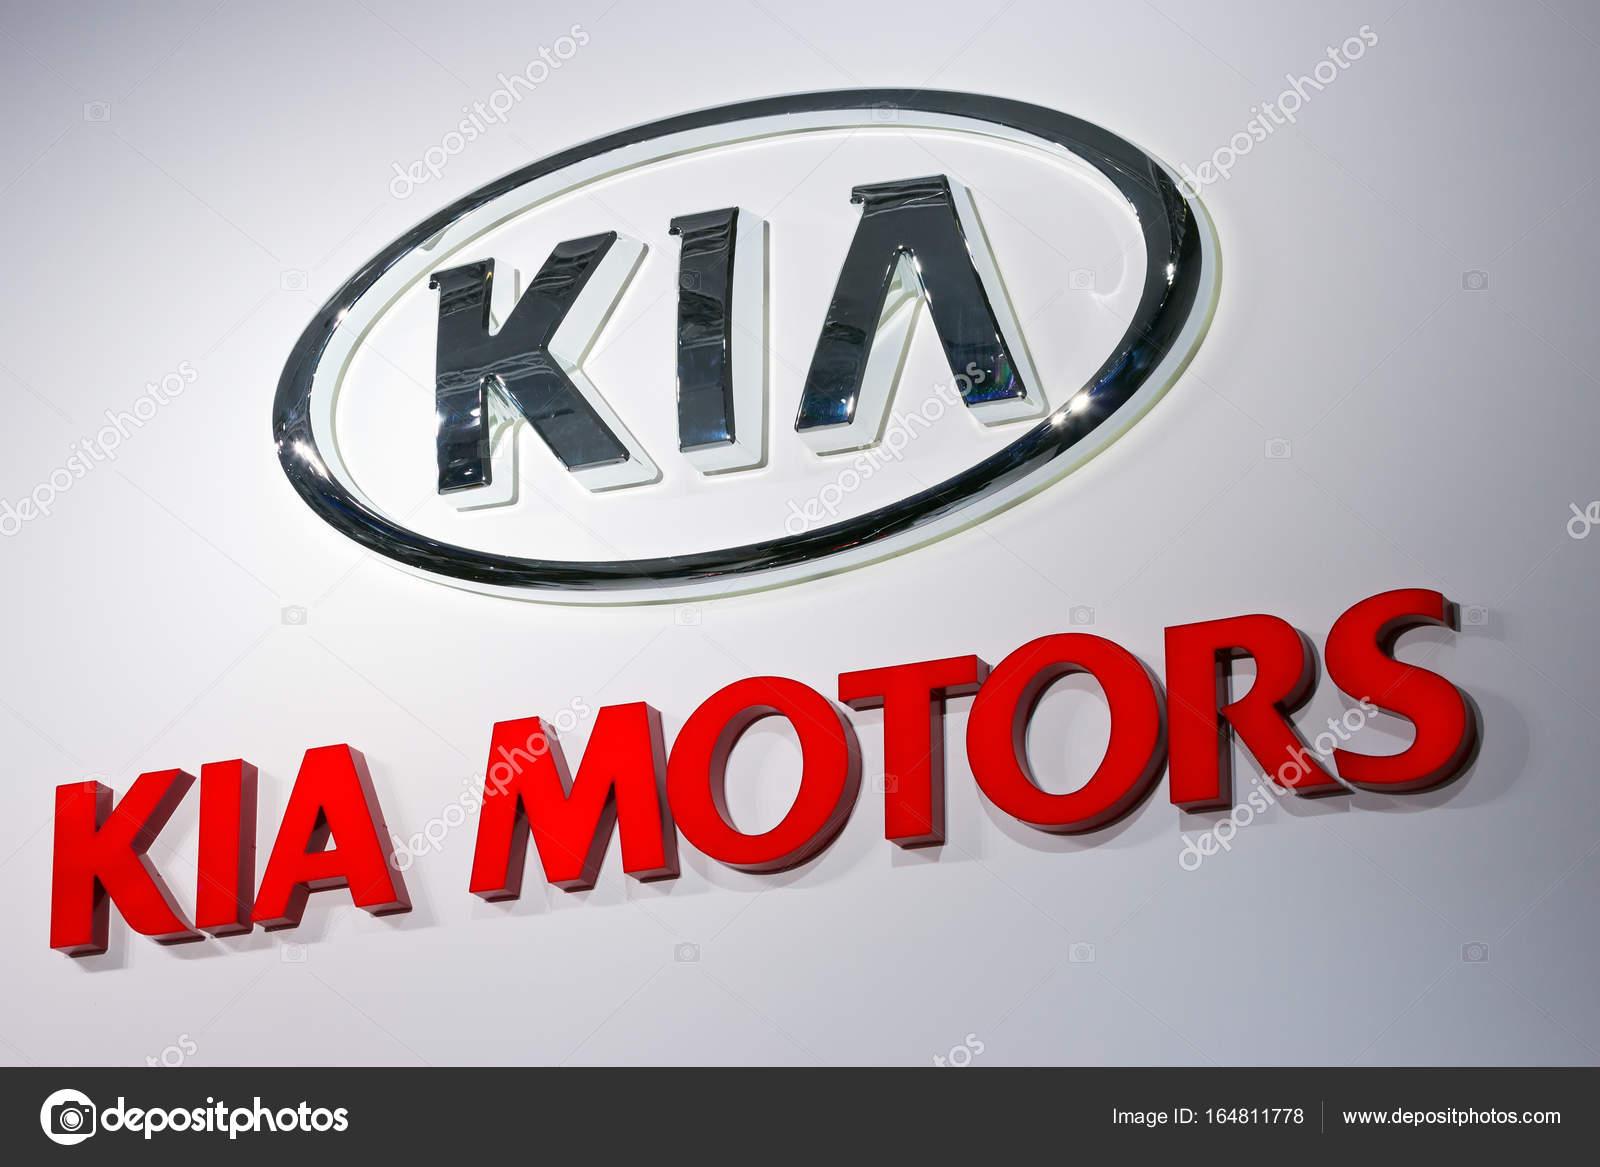 Kia motors symbol stock editorial photo foto vdw 164811778 kia motors symbol stock photo biocorpaavc Image collections